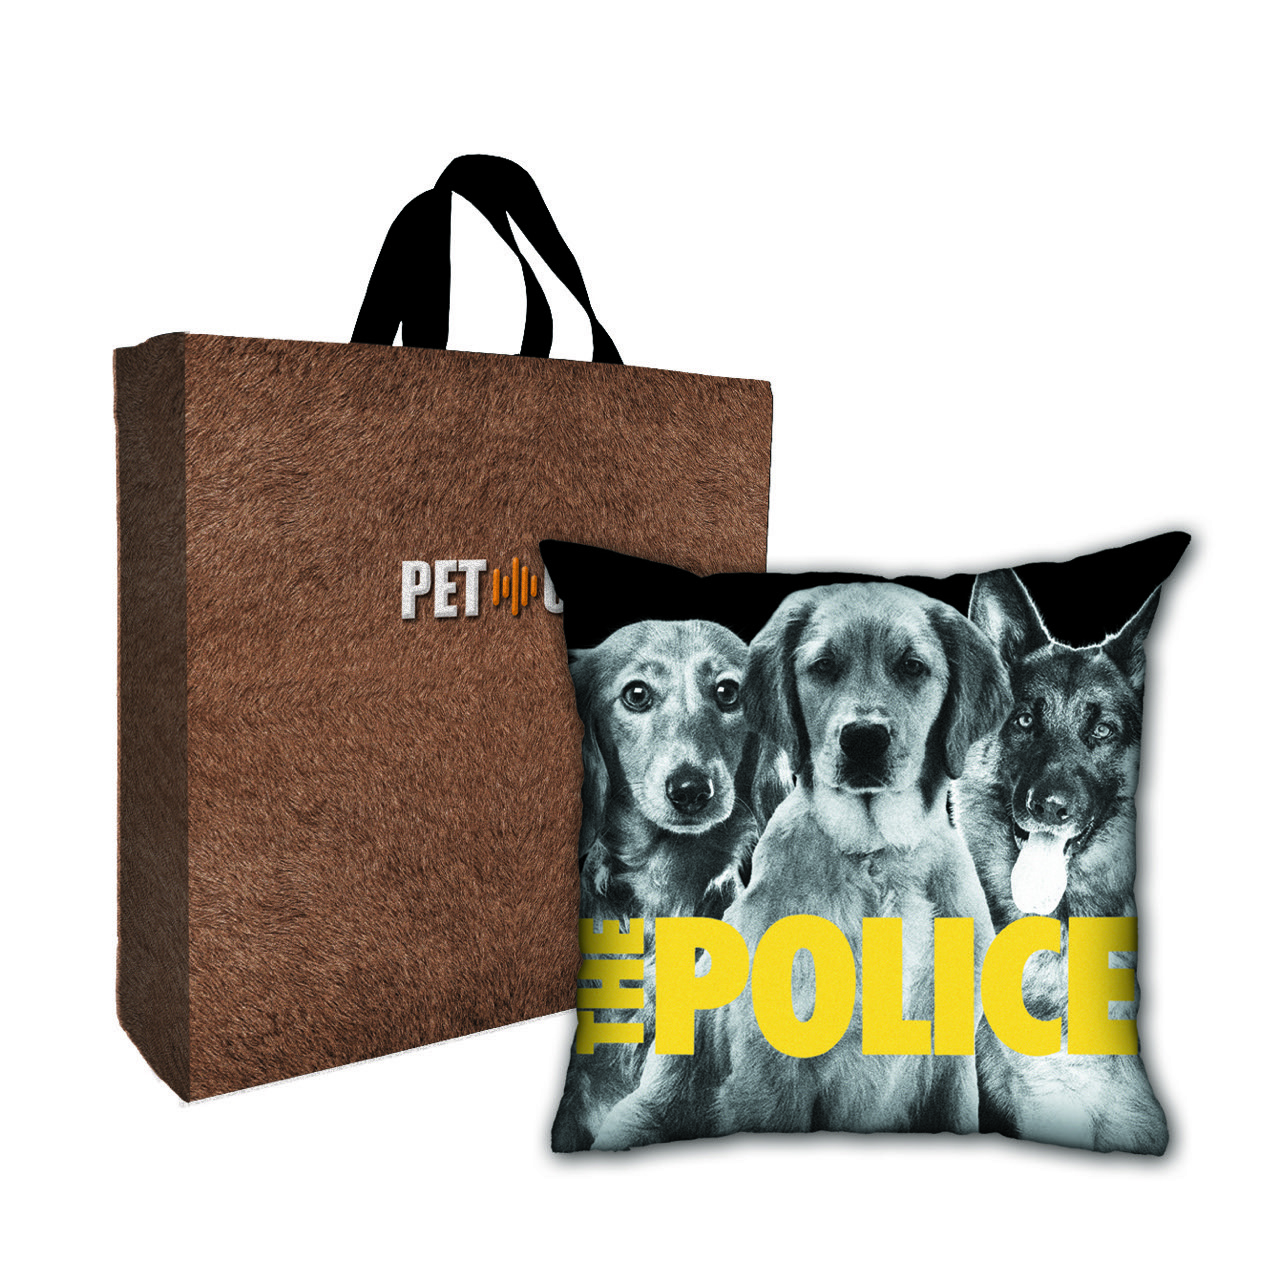 Kit Almofada & Sacola Bege Pet Use -Security Dogs - Cachorros